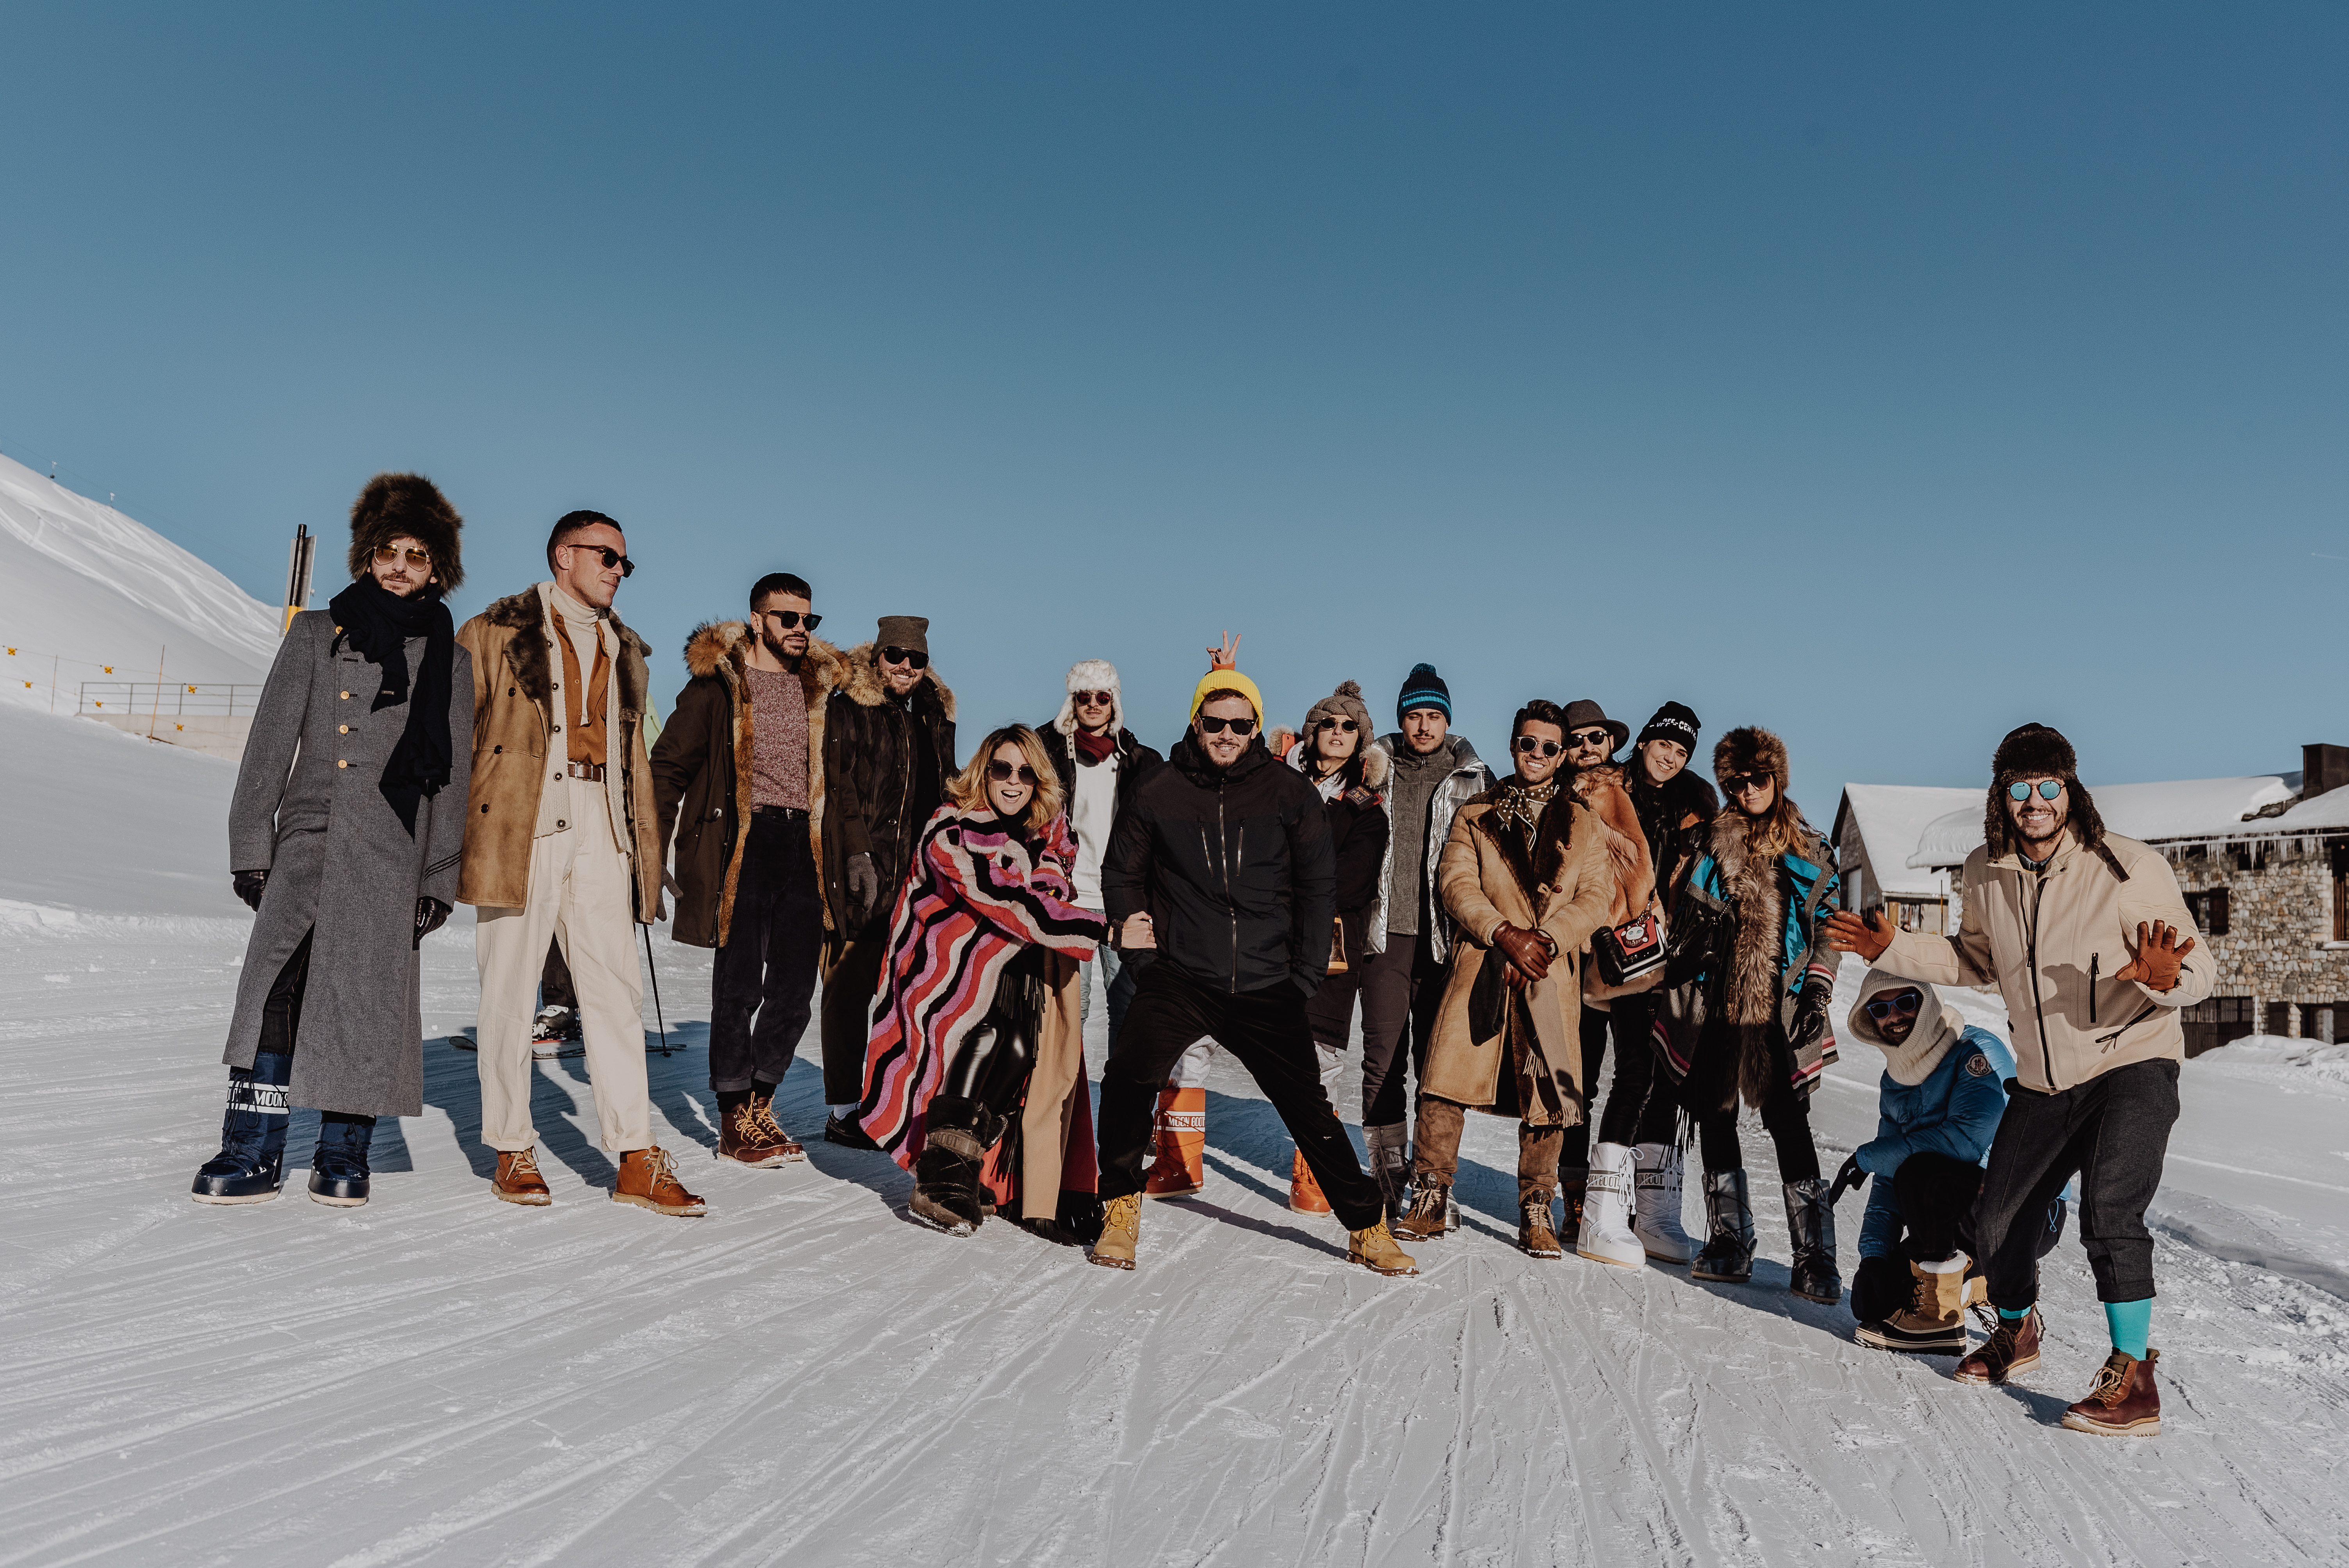 Influencer machen St. Moritz bekannter Slide 1